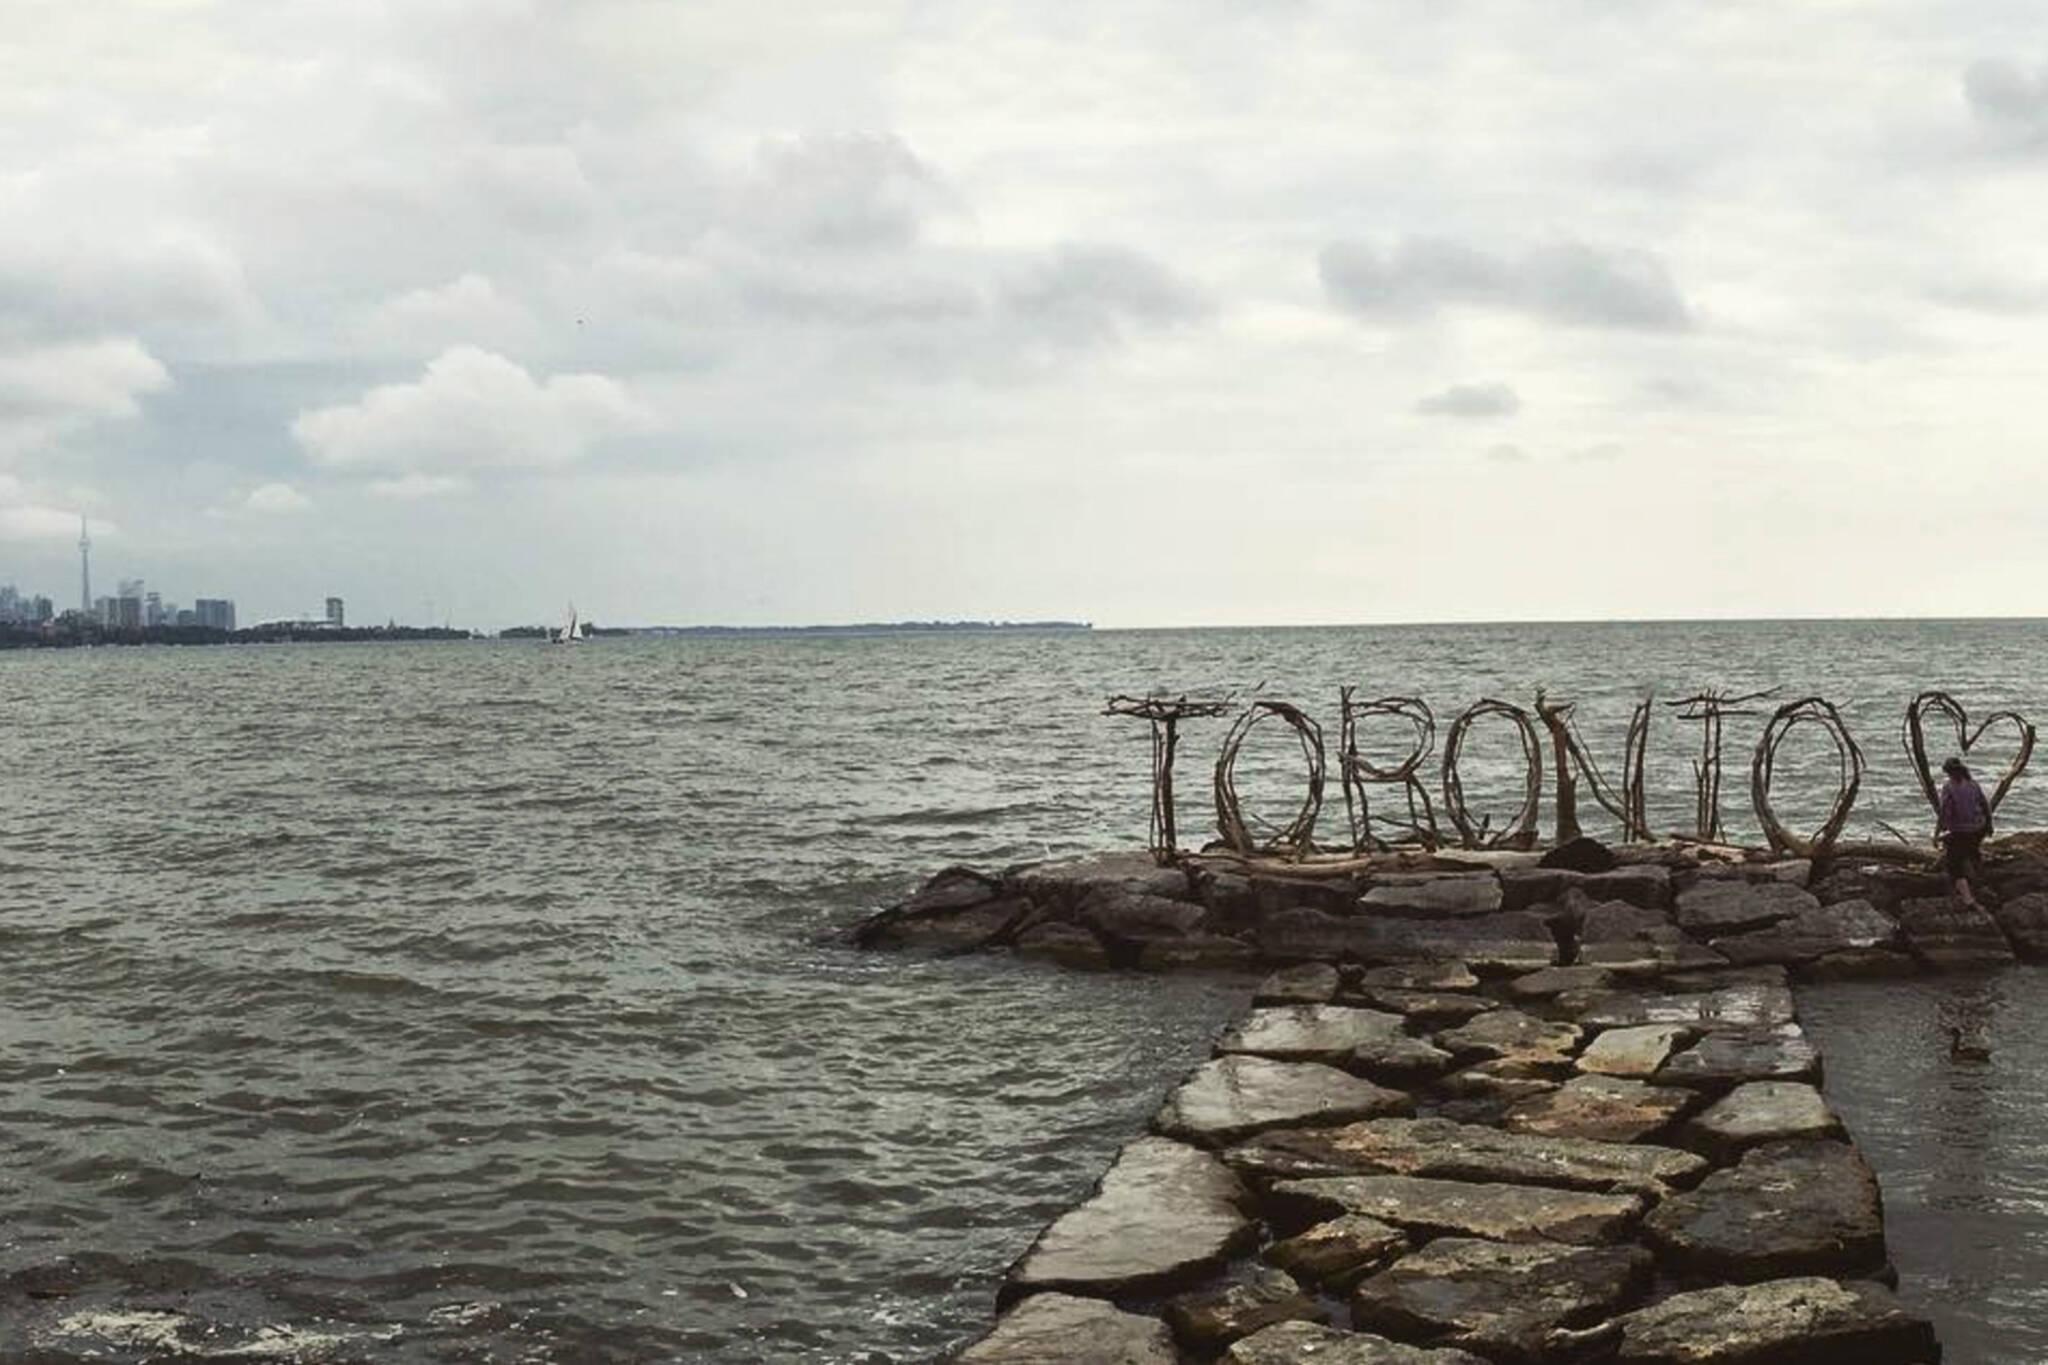 new toronto sign